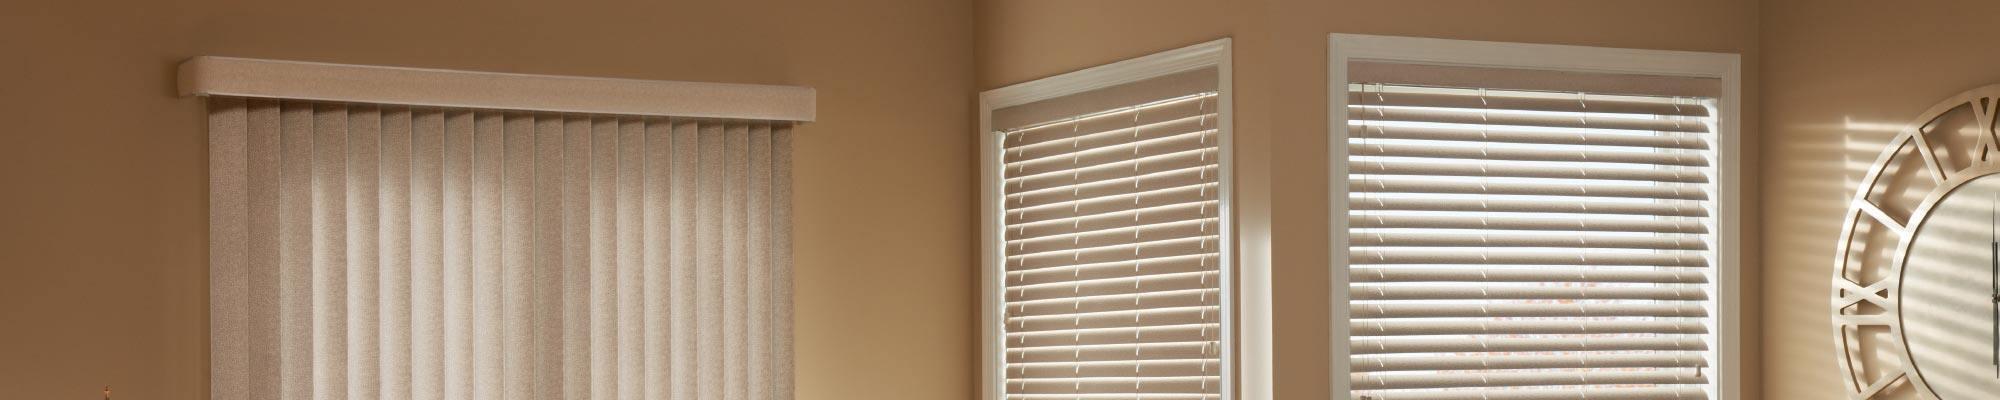 window blinds las vegas nv